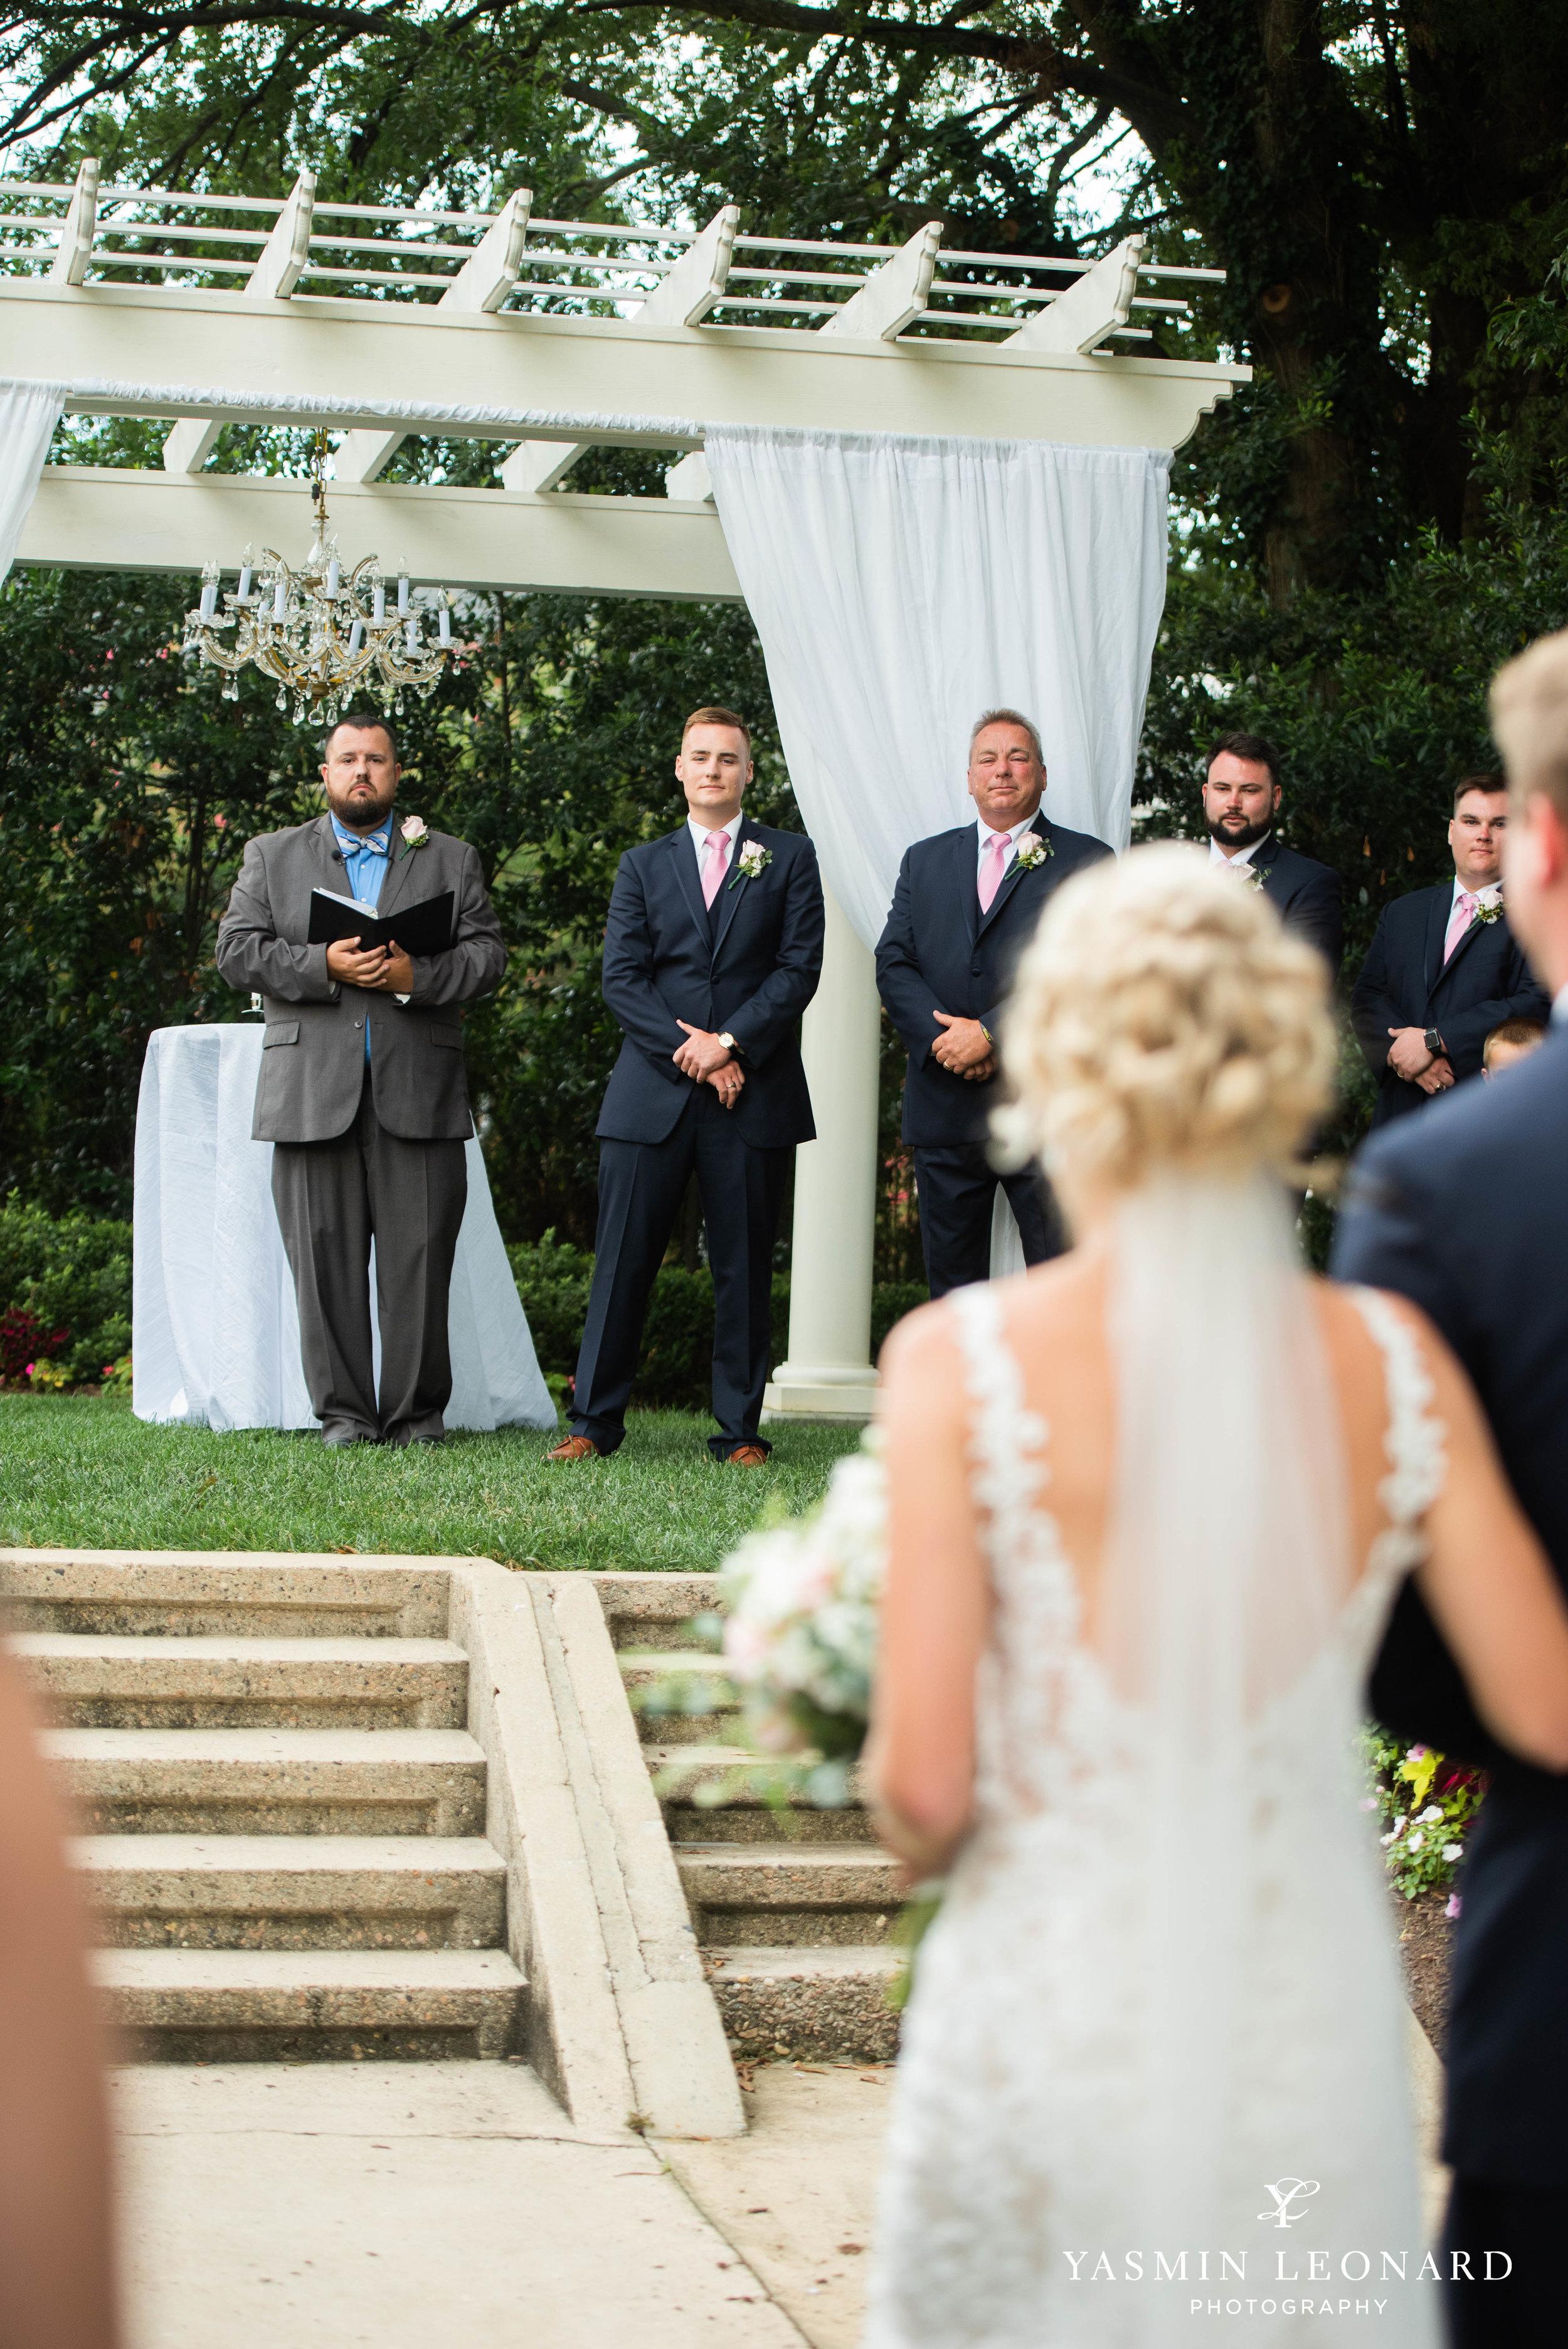 Separk Mansion - NC Weddings - Gastonia Wedding - NC Wedding Venues - Pink and Blue Wedding Ideas - Pink Bridesmaid Dresses - Yasmin Leonard Photography-20.jpg